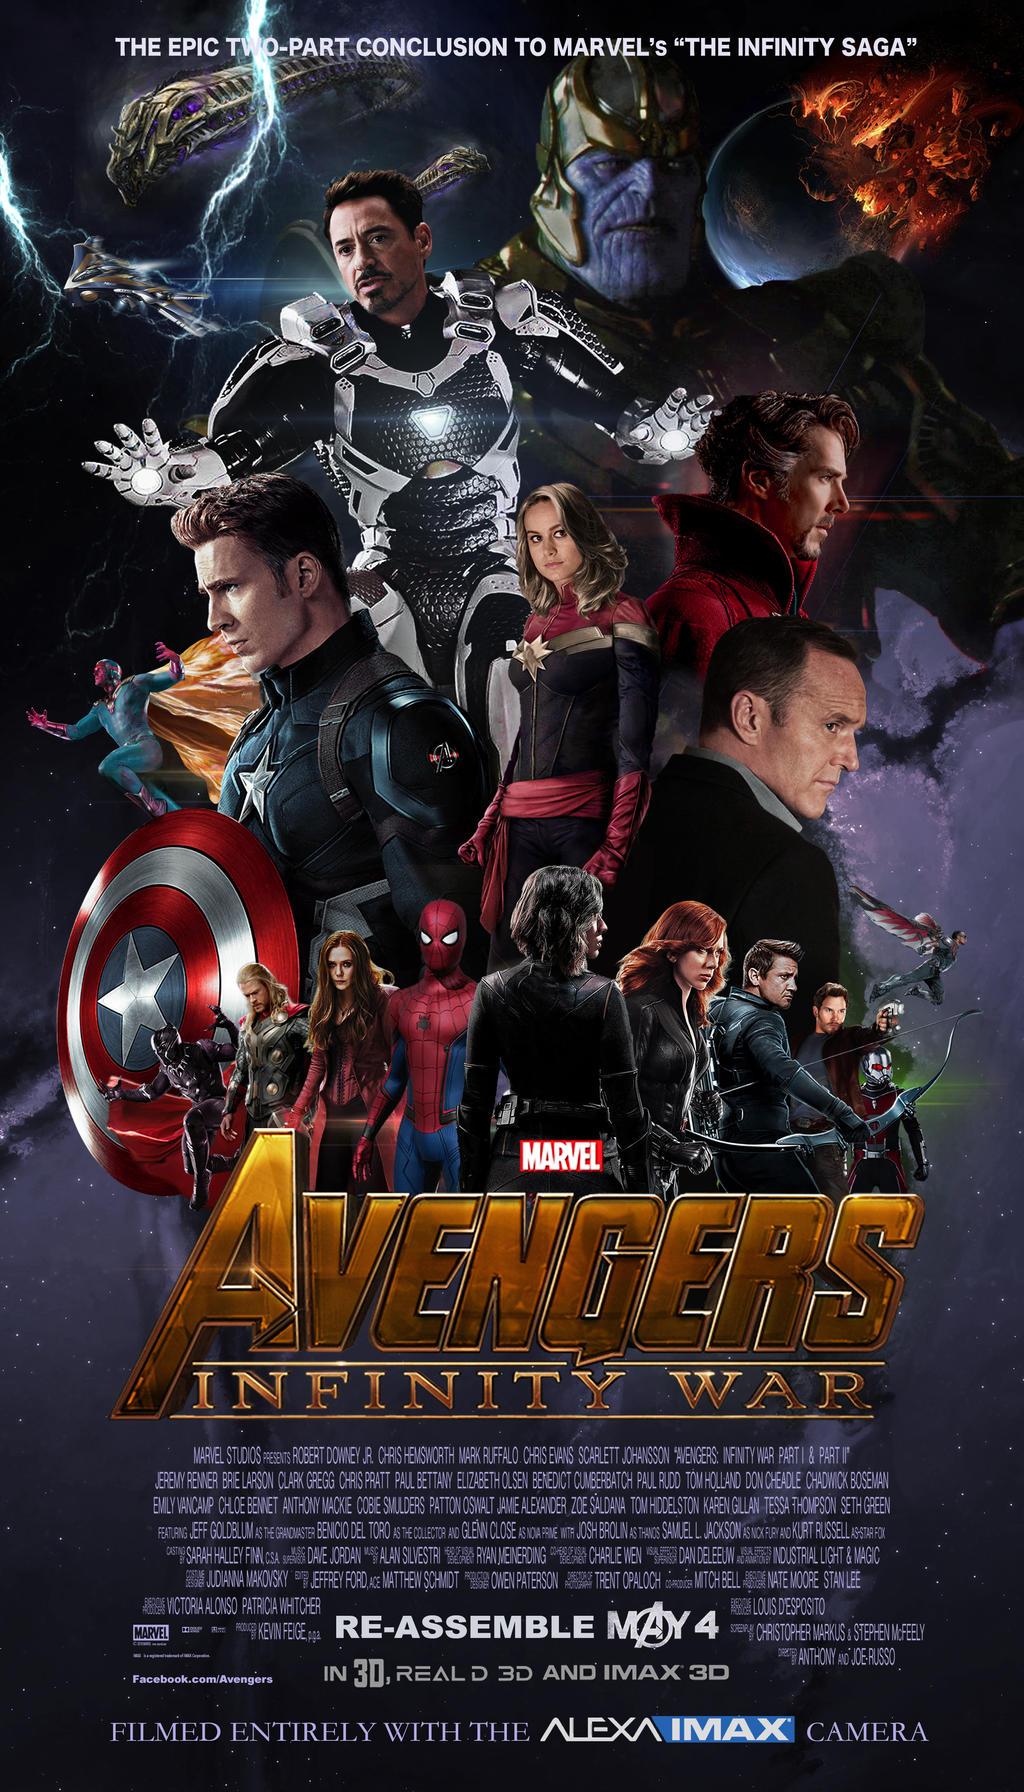 the avengers infinity war part 1 cast : die neunte kompanie film online